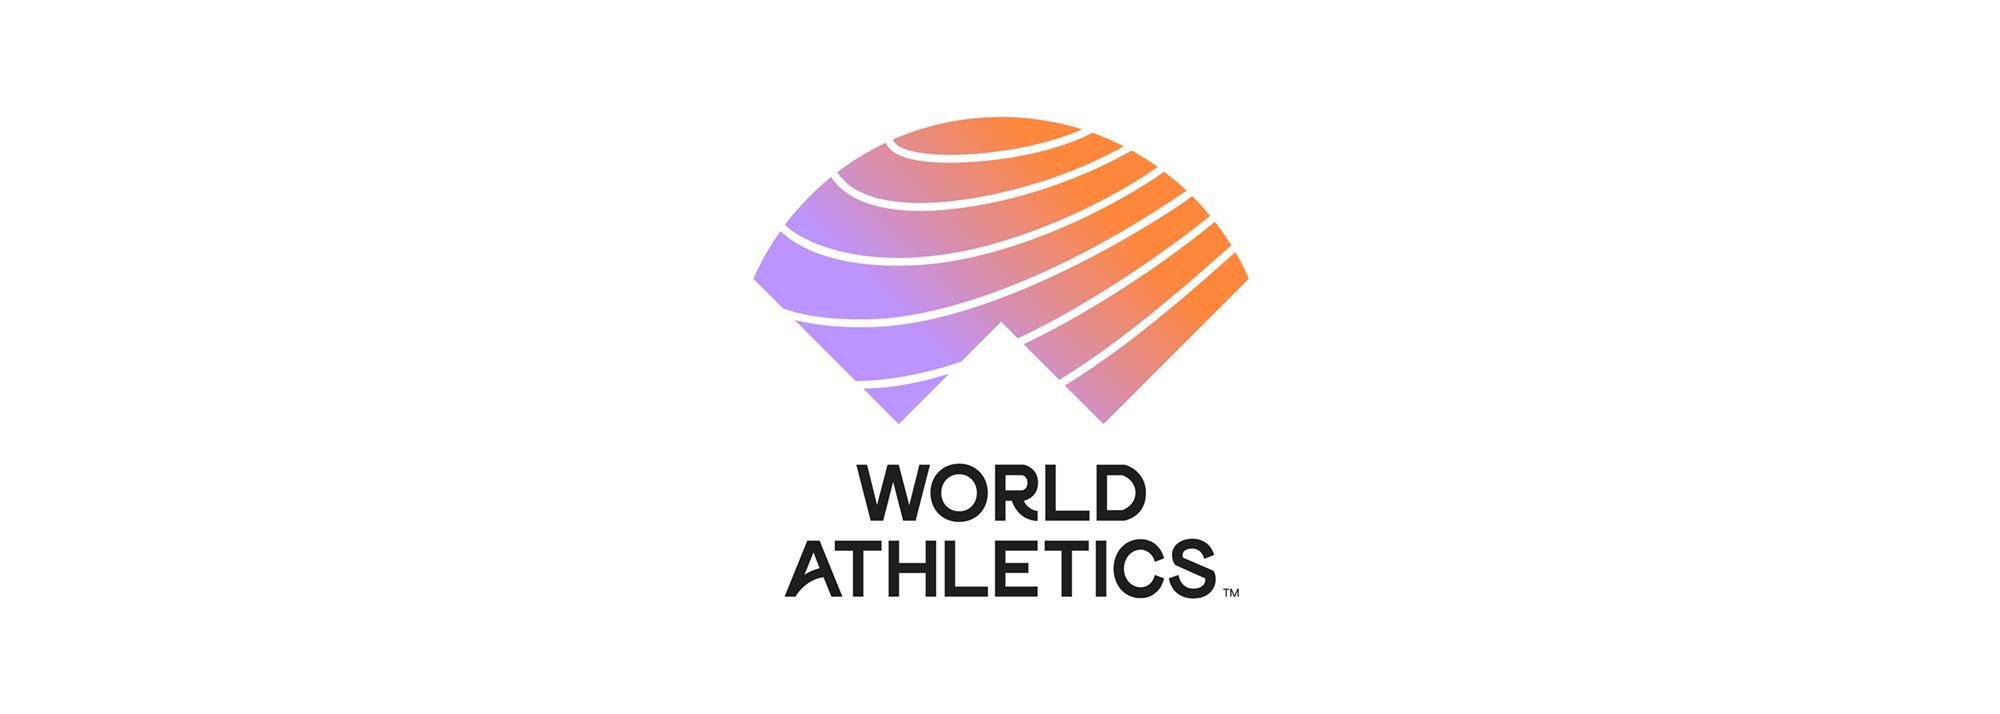 World Athletics is seeking a Head of Development of the Sport